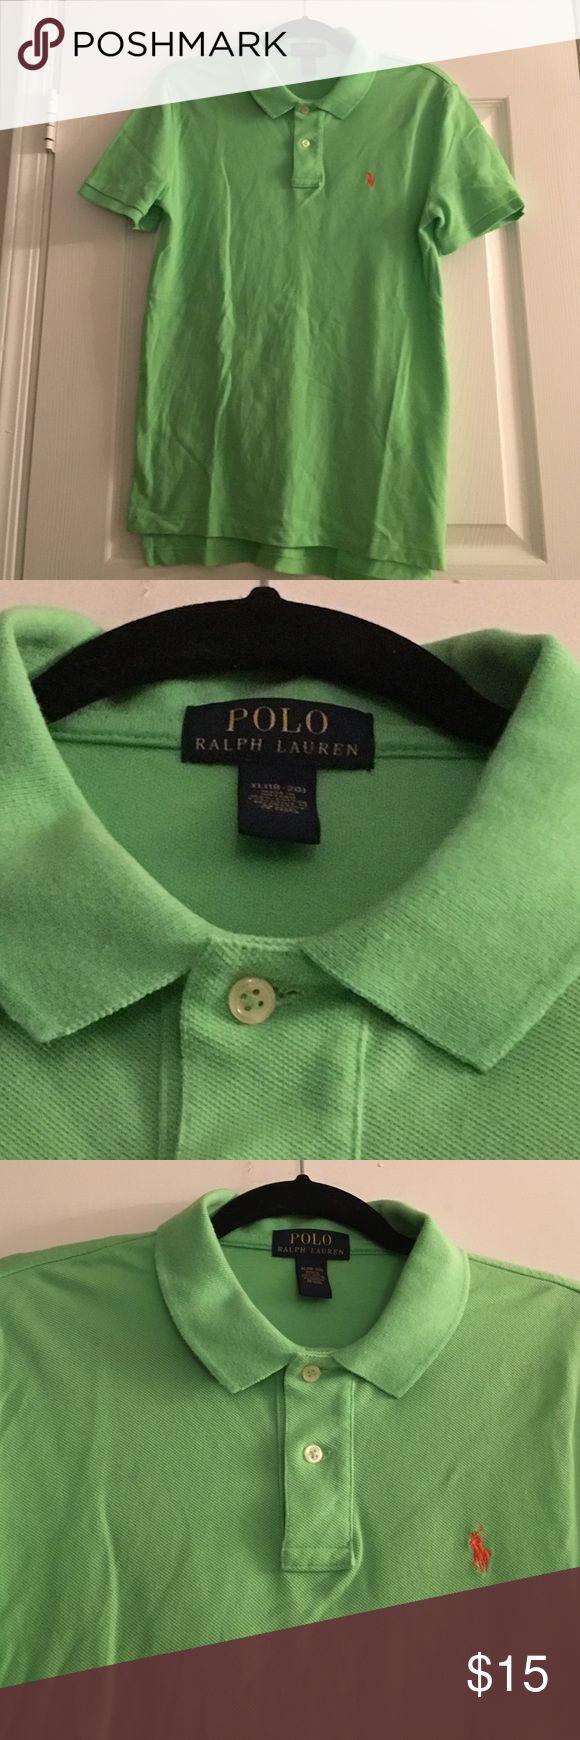 Lime green Ralph Lauren Polo Shirt Lime green polo with orange logo Polo by Ralph Lauren Shirts & Tops Polos